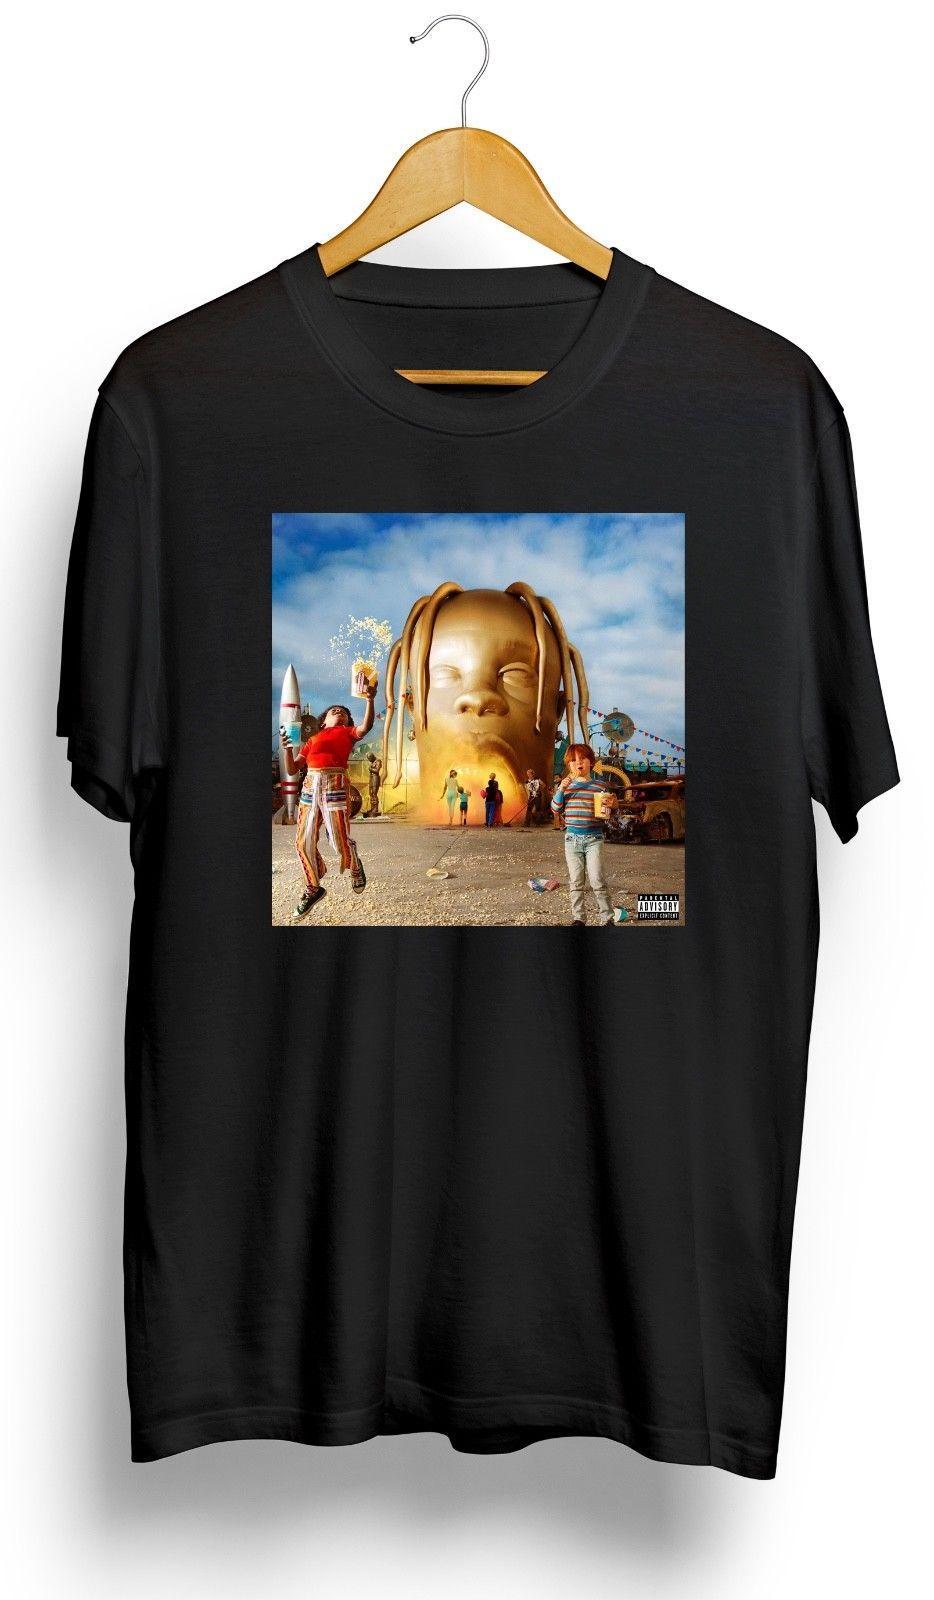 100Algodón Camiseta De ScottAstroworld Compre Travis nO8wvyPmN0